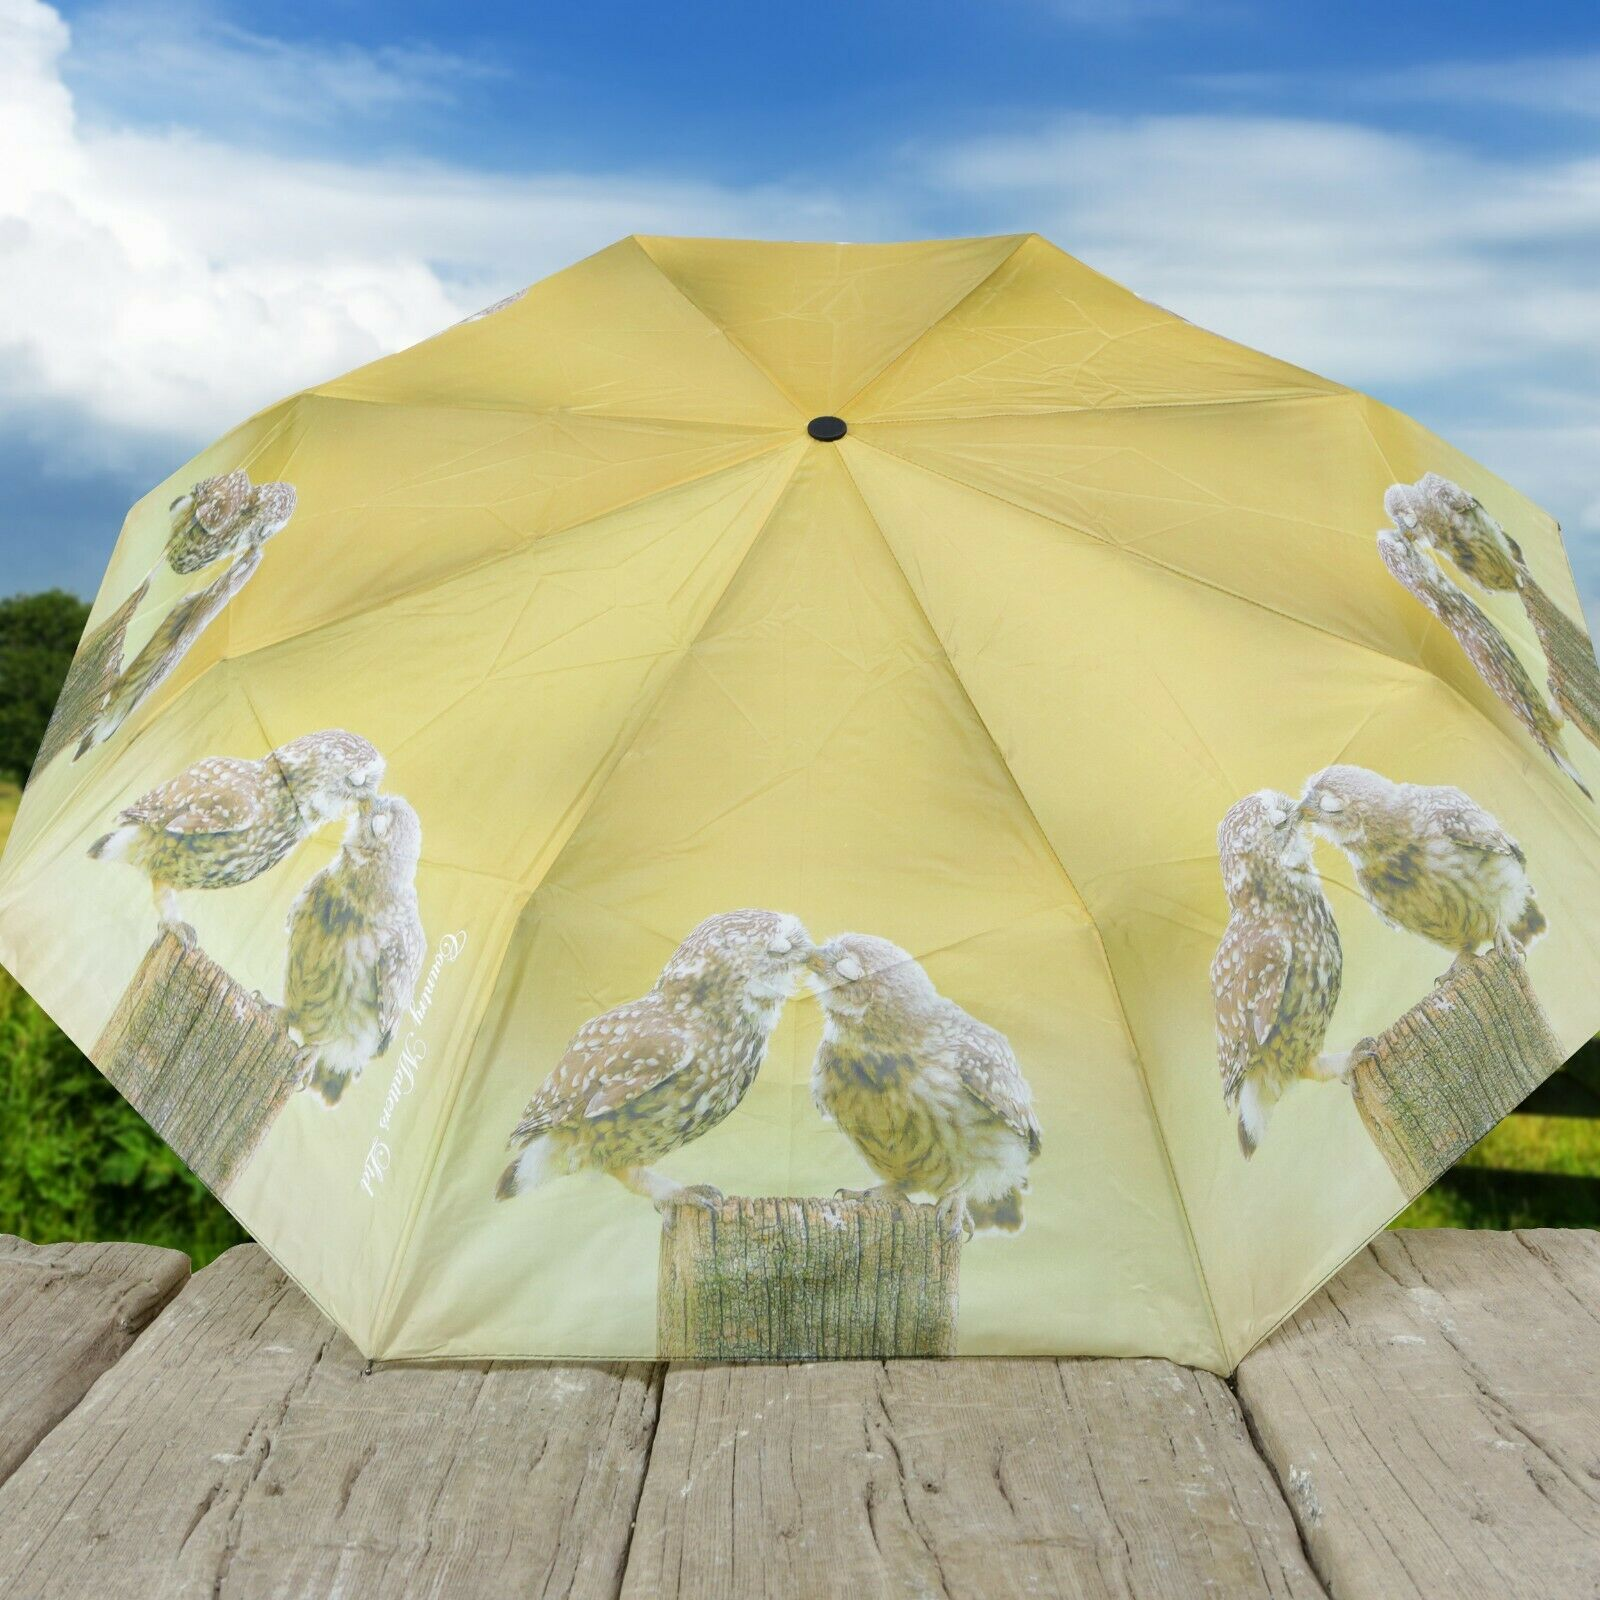 Country Matters Bird Design Telescopic Folding Brolly Umbrella - Kissing Owls